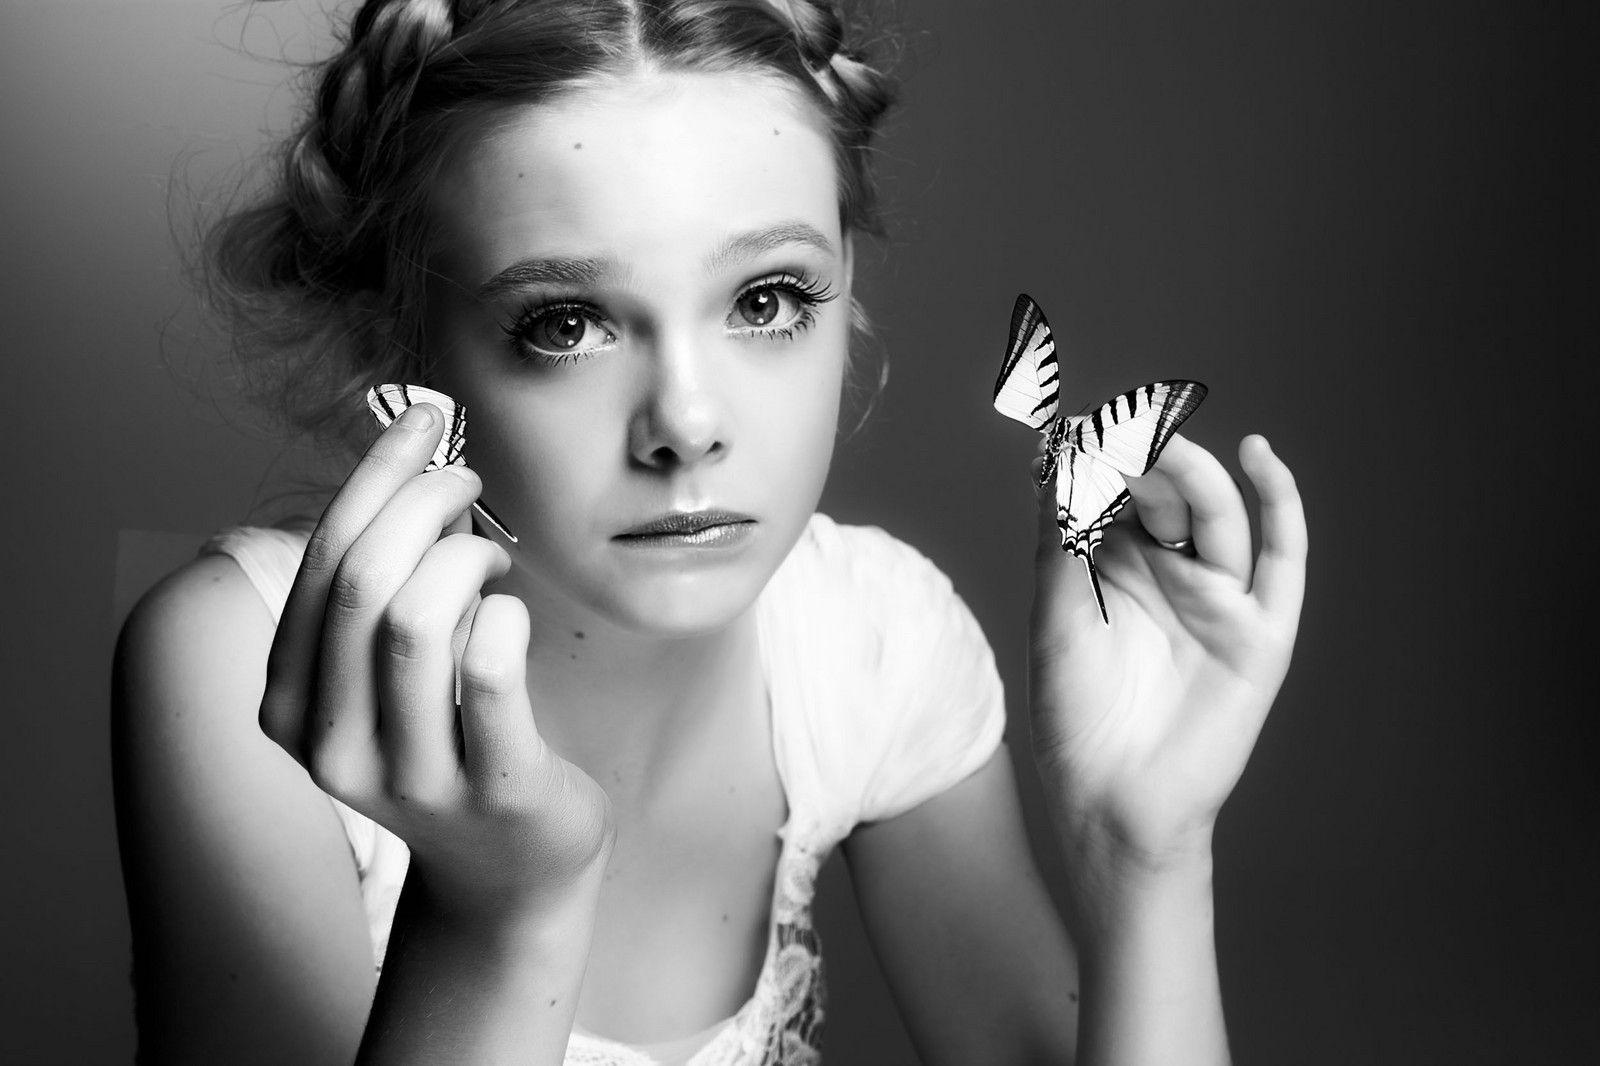 Elle Fanning photoshoot by Steven Pan (2011)